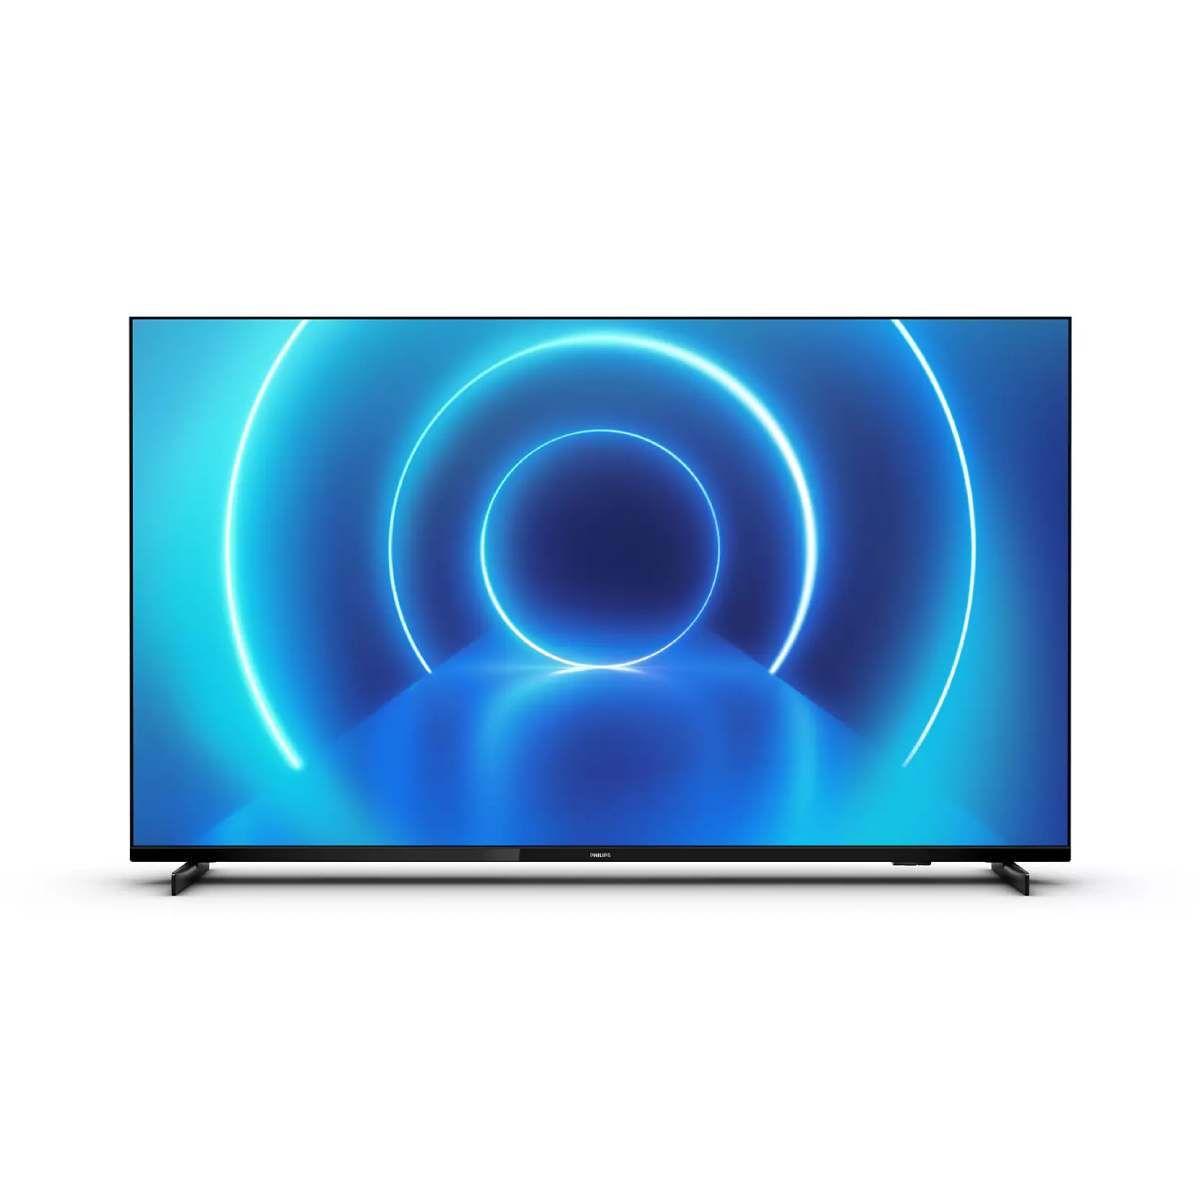 Phillips 50 ಇಂಚು 4K UHD LED Smart TV (50PUT7605/94)